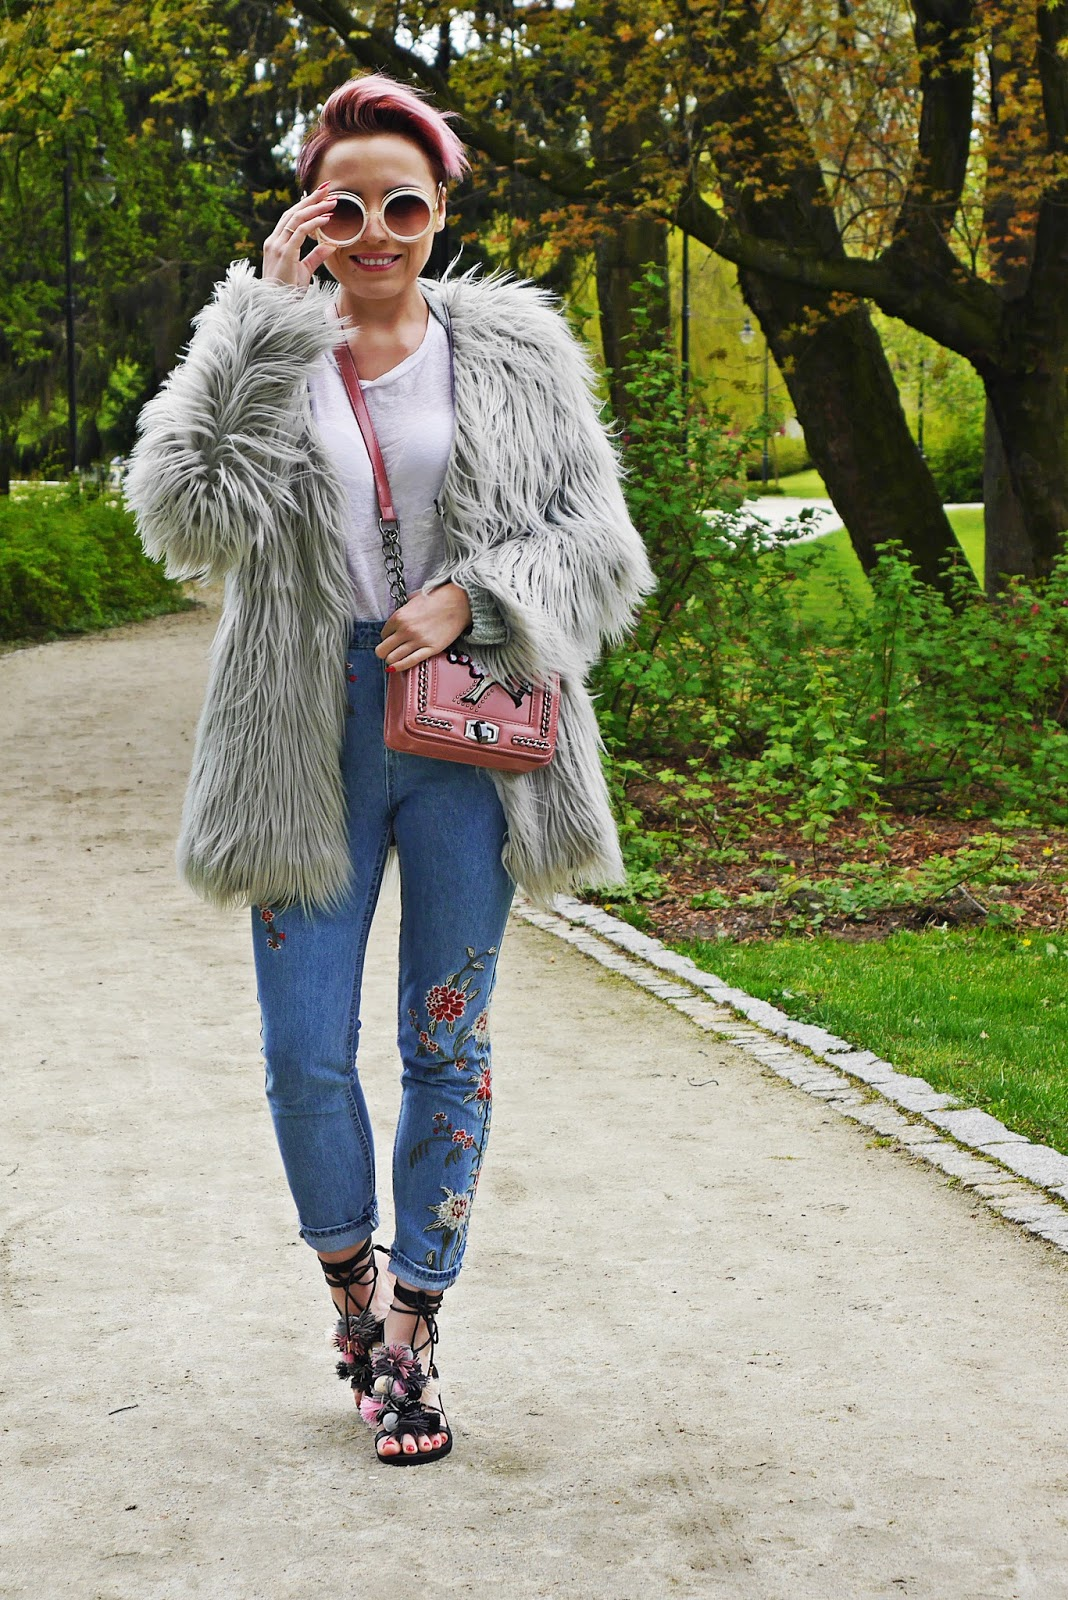 spodnie_haft_szare_futerko_look_ootd_karyn_blog_020517a